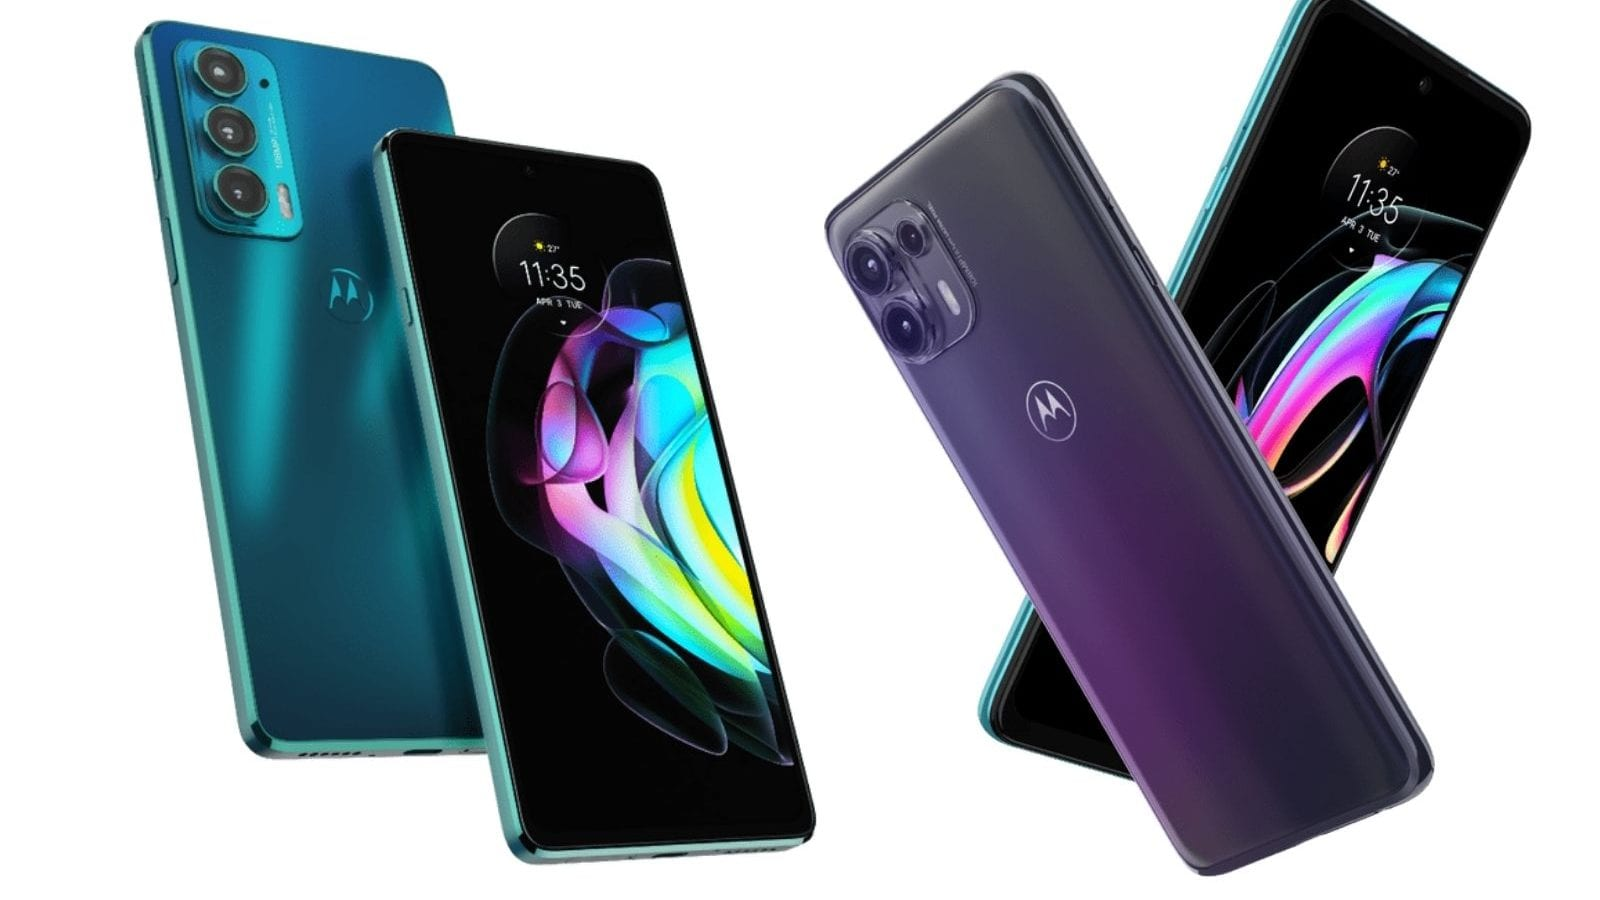 Motorola Edge 20's Sale in India Postponed Due to 'Unforeseen Circumstances'